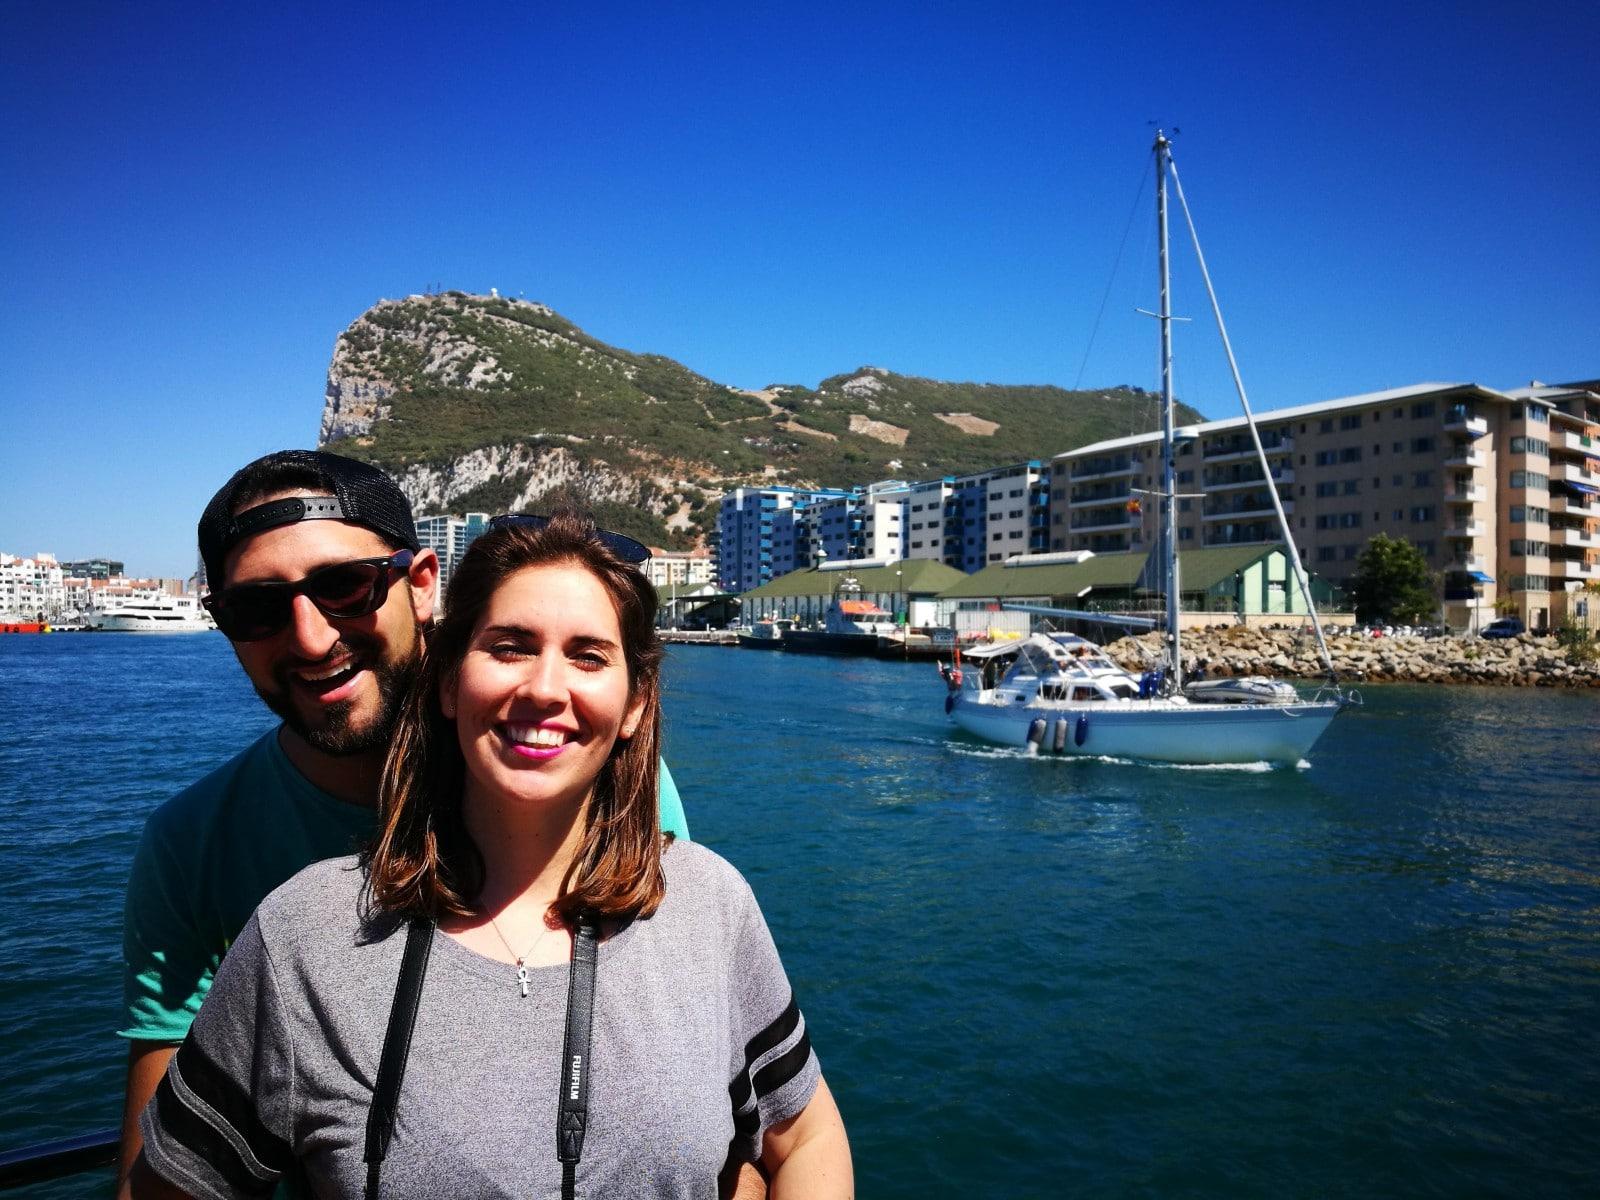 23-jun-2019-blogueros-espaoles-de-viajes-visitan-el-pen_48114498553_o